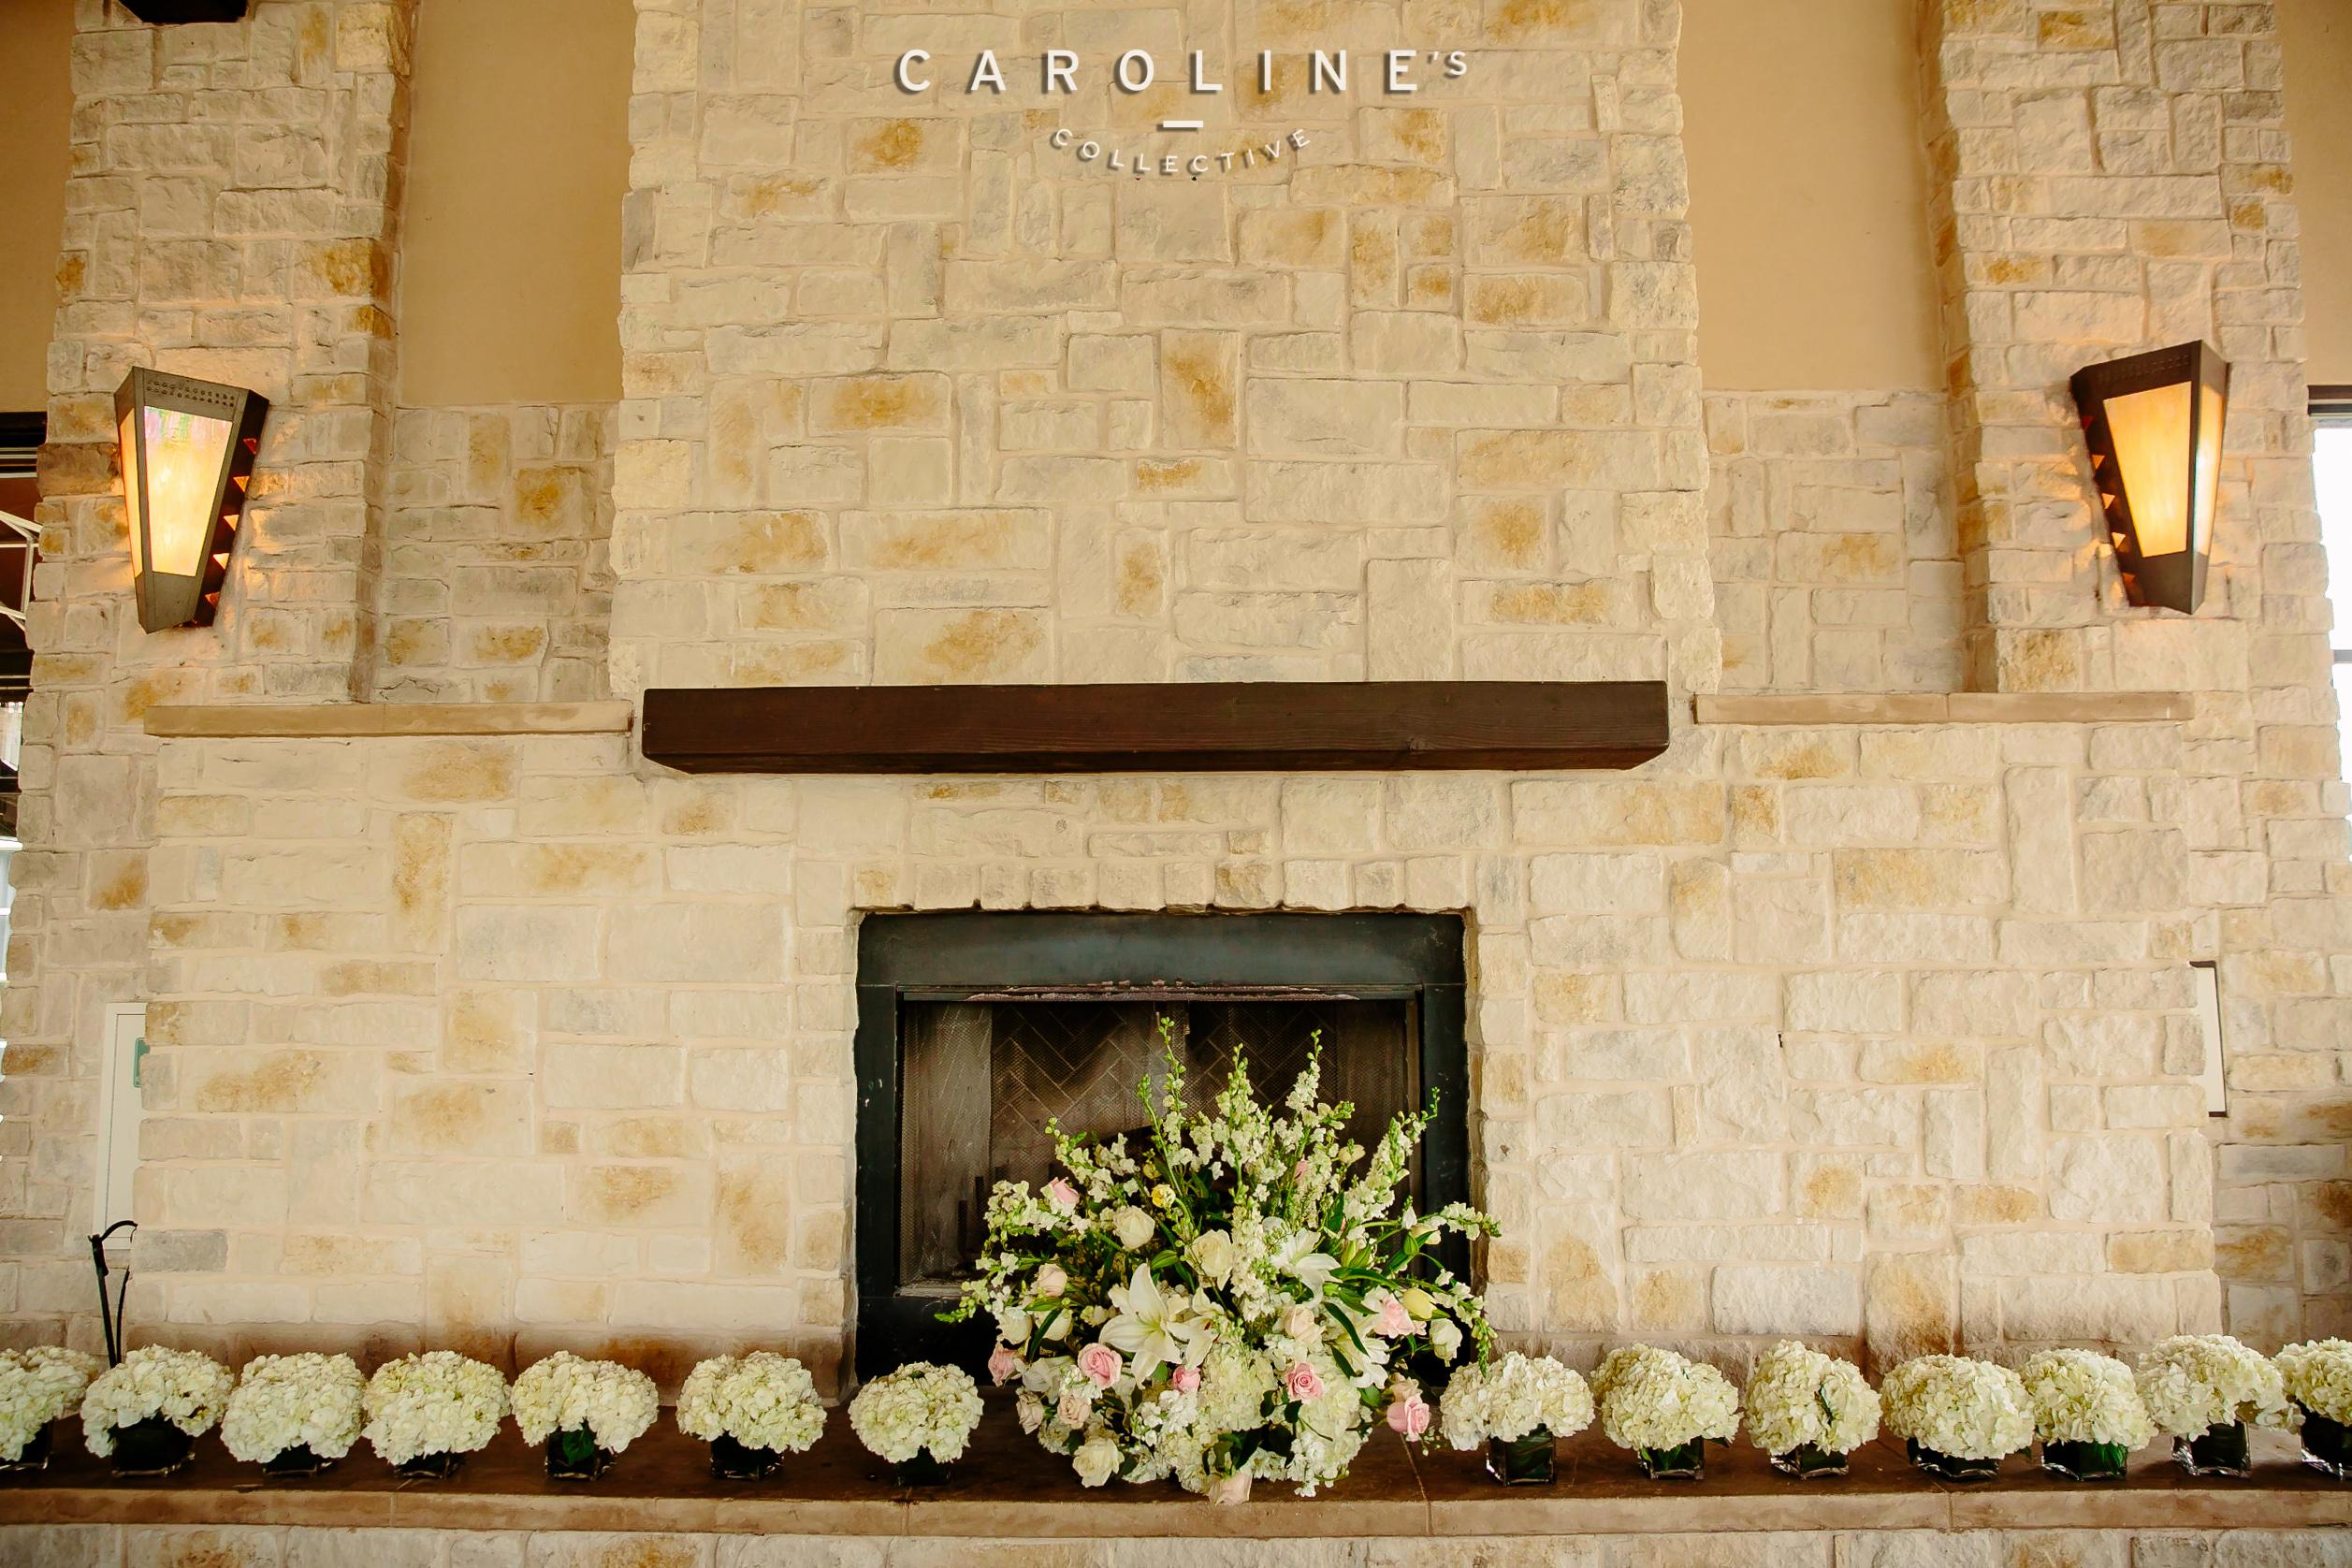 CarolinesCollective (6 of 163)